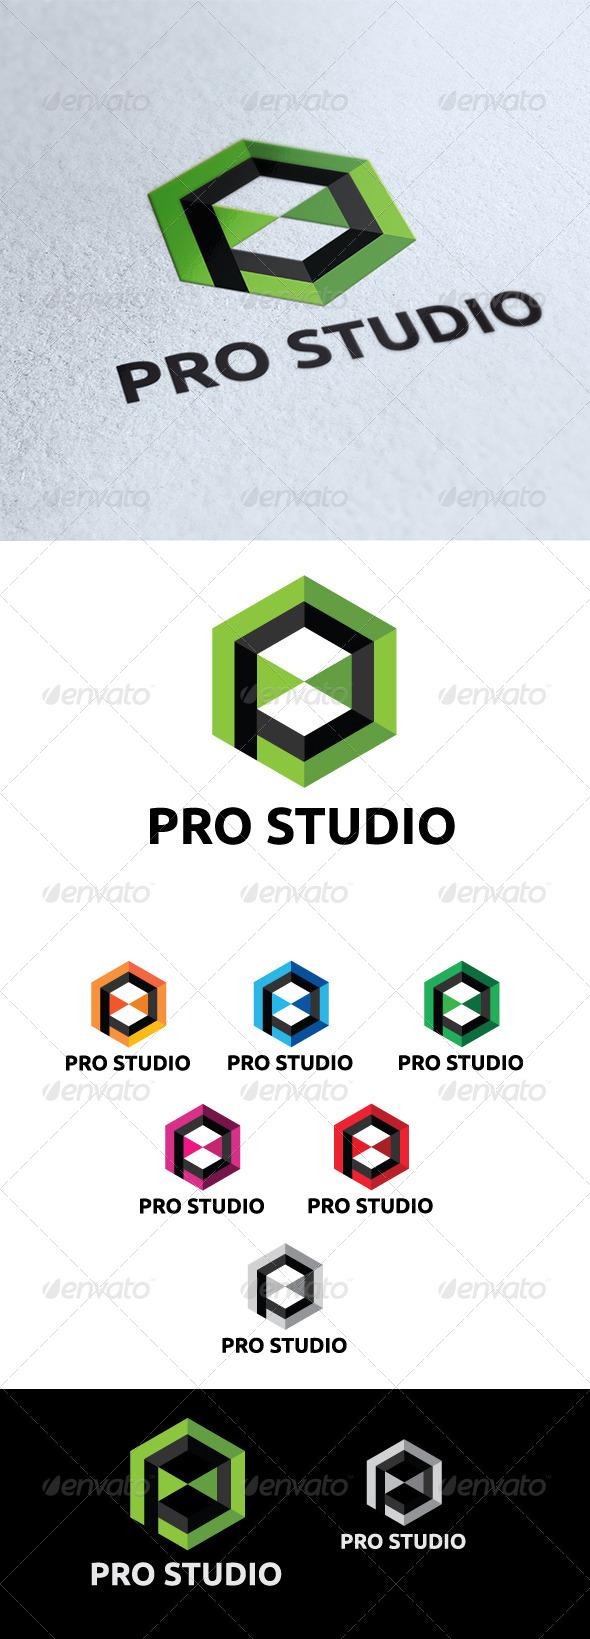 GraphicRiver Pro Studio Logo 5746835